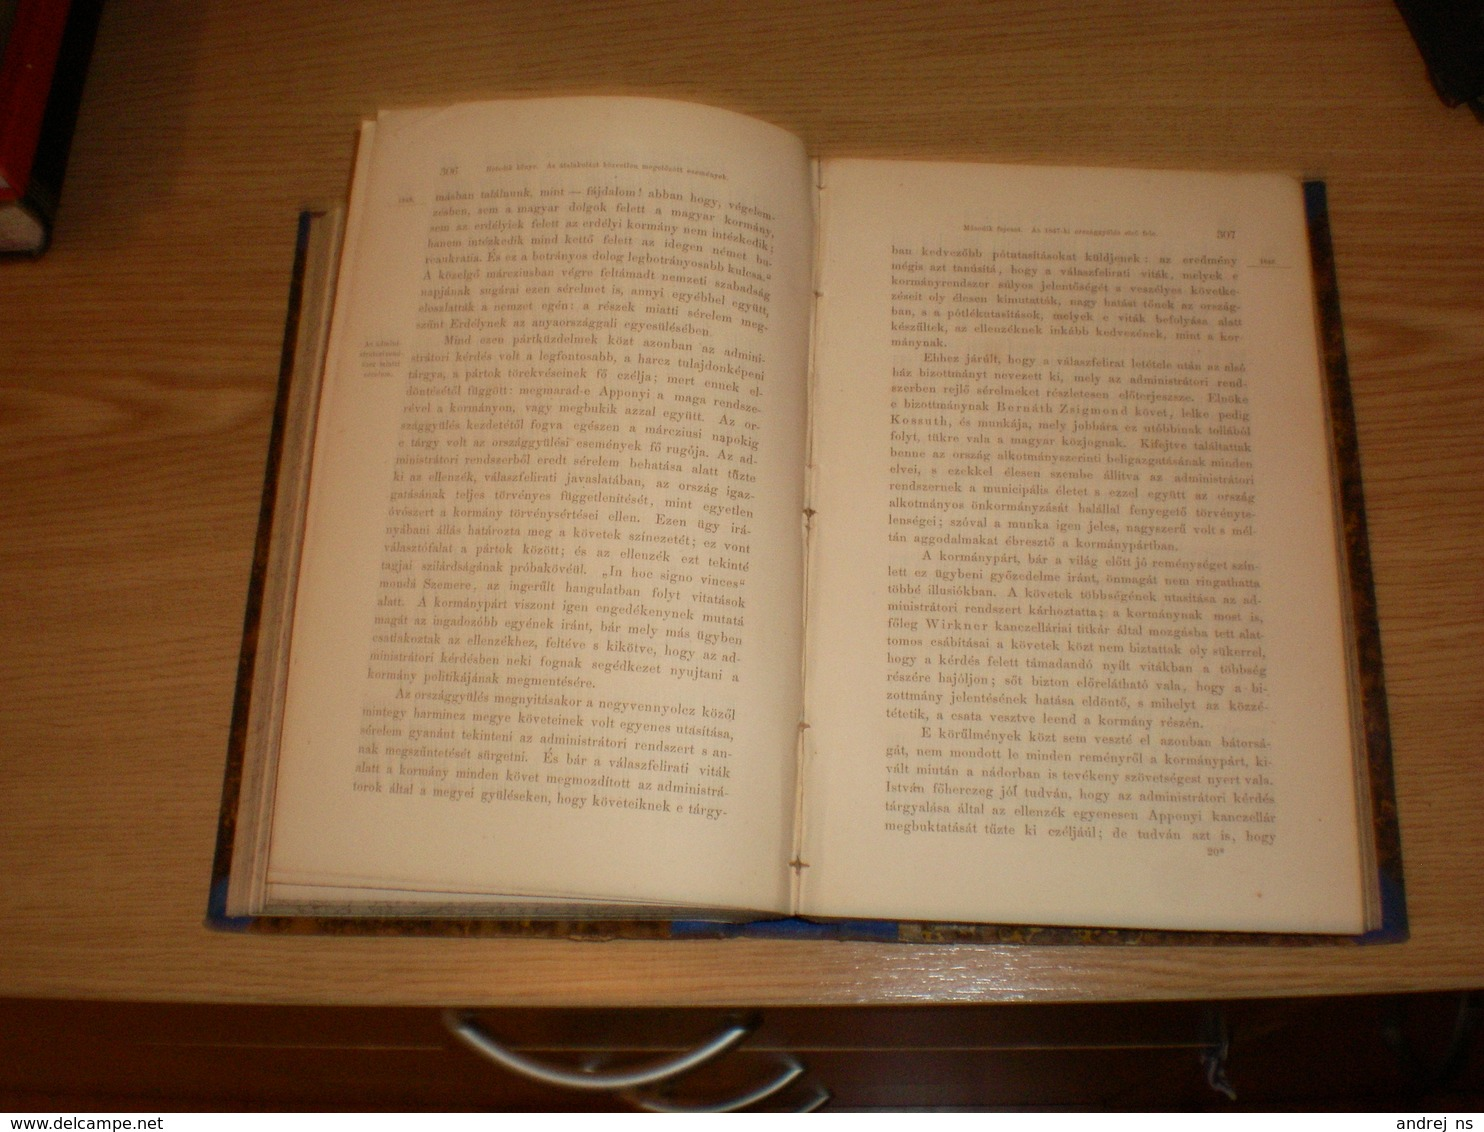 Hungary Huszonot Ev Magyarorszag Tortenelmebol I II III Horvath Mihaly Pest 1868 Rath Mor - Livres, BD, Revues